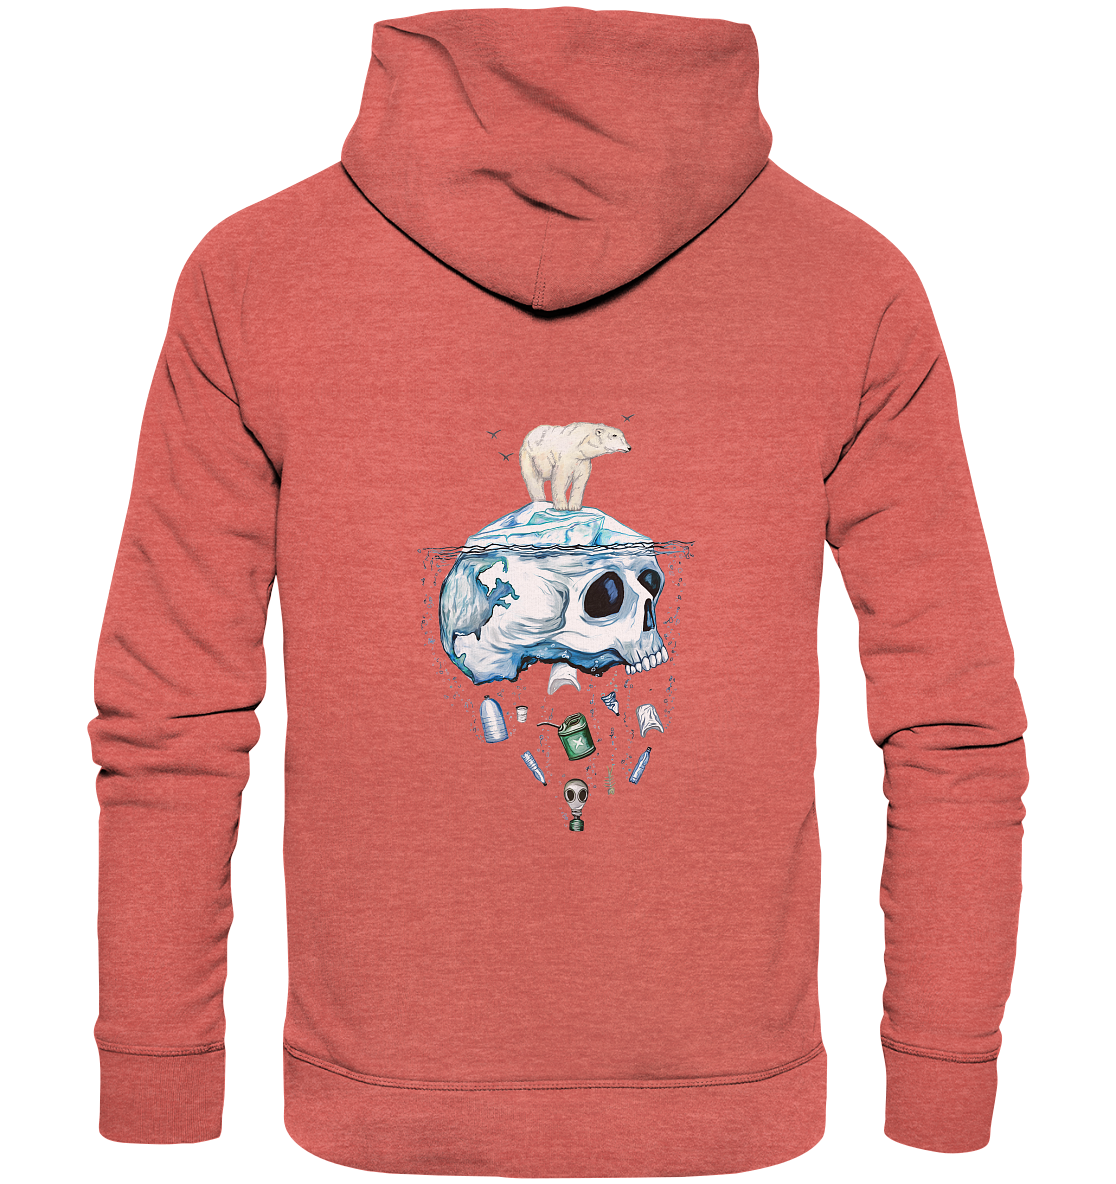 back-organic-hoodie-e05651-1116x.png